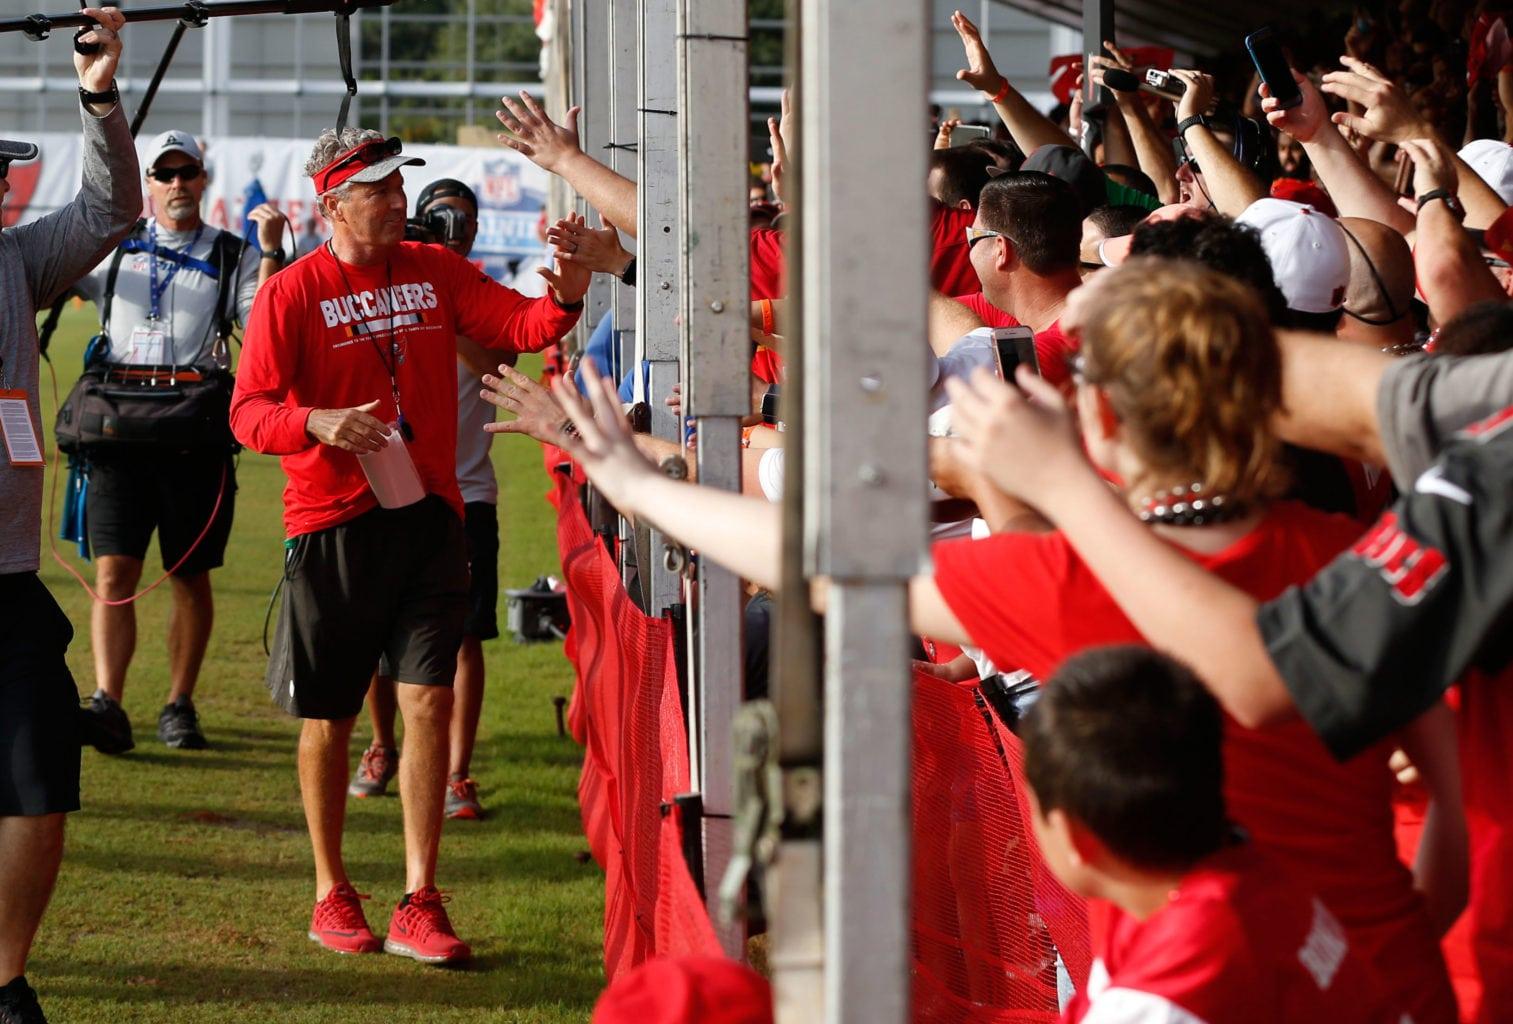 Bucs Camp Recap 8-5: Stars Shine On Stick Carrier Saturday